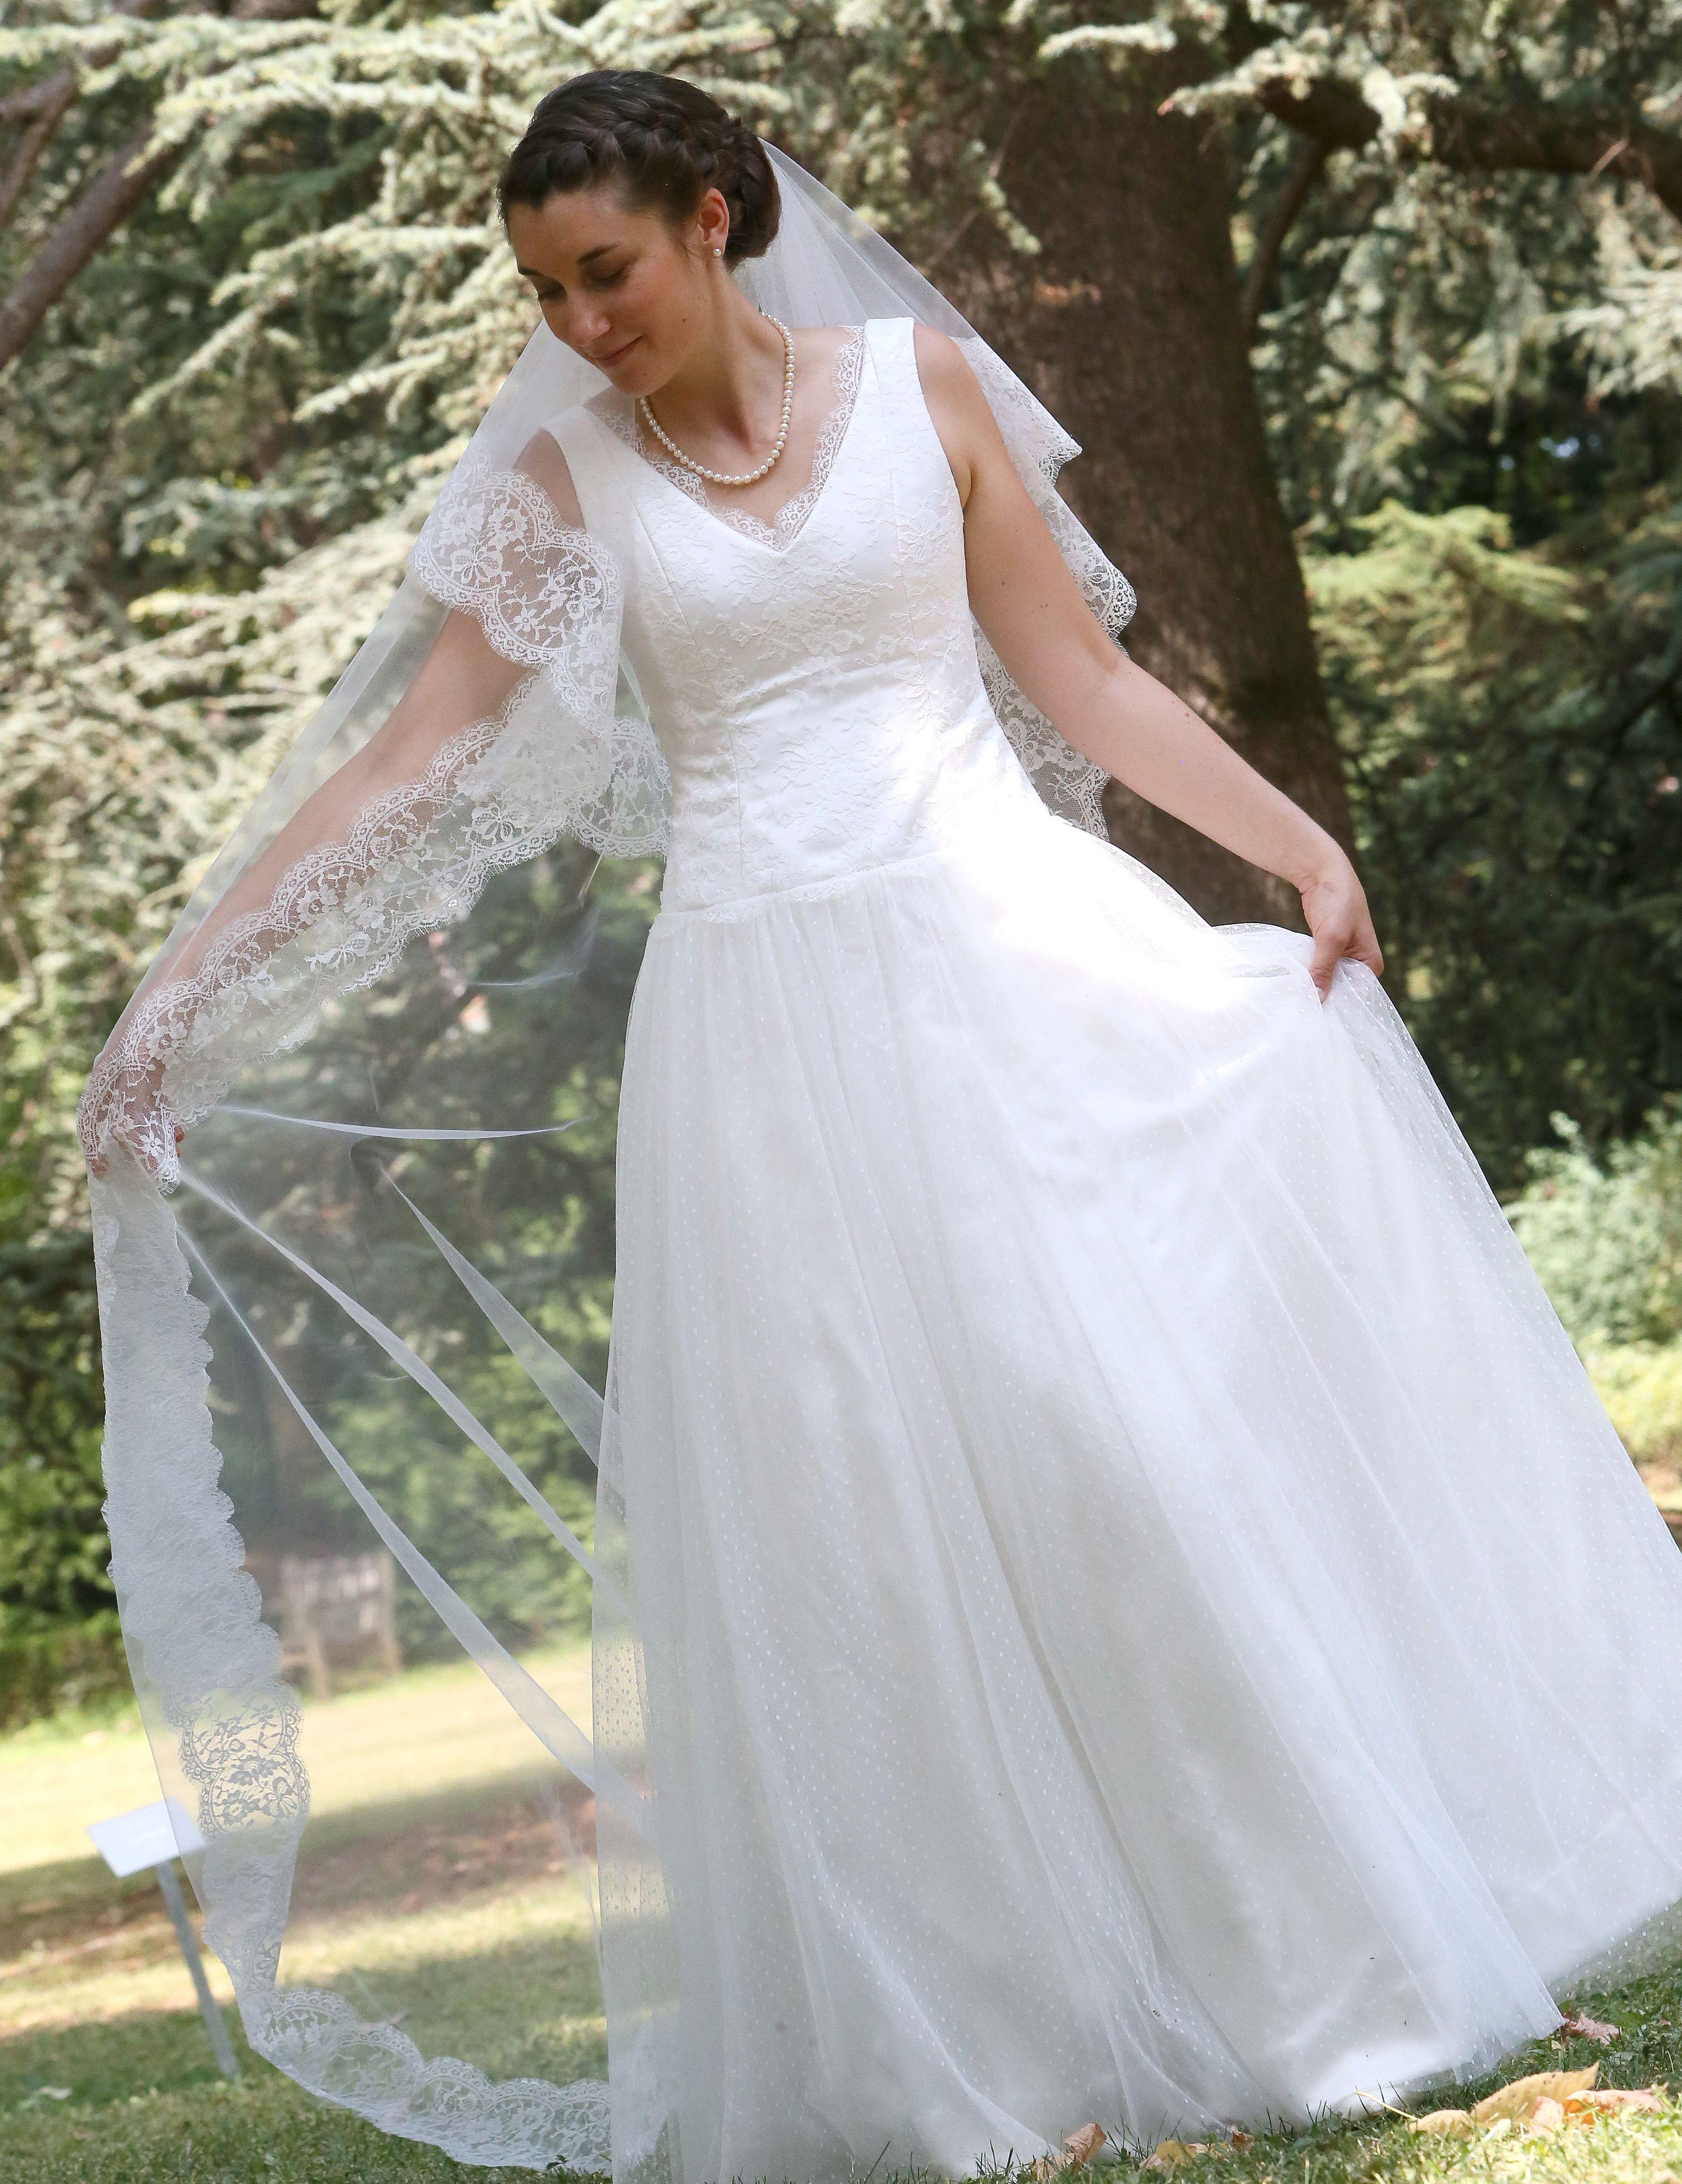 Robe mariee sur mesure toulouse